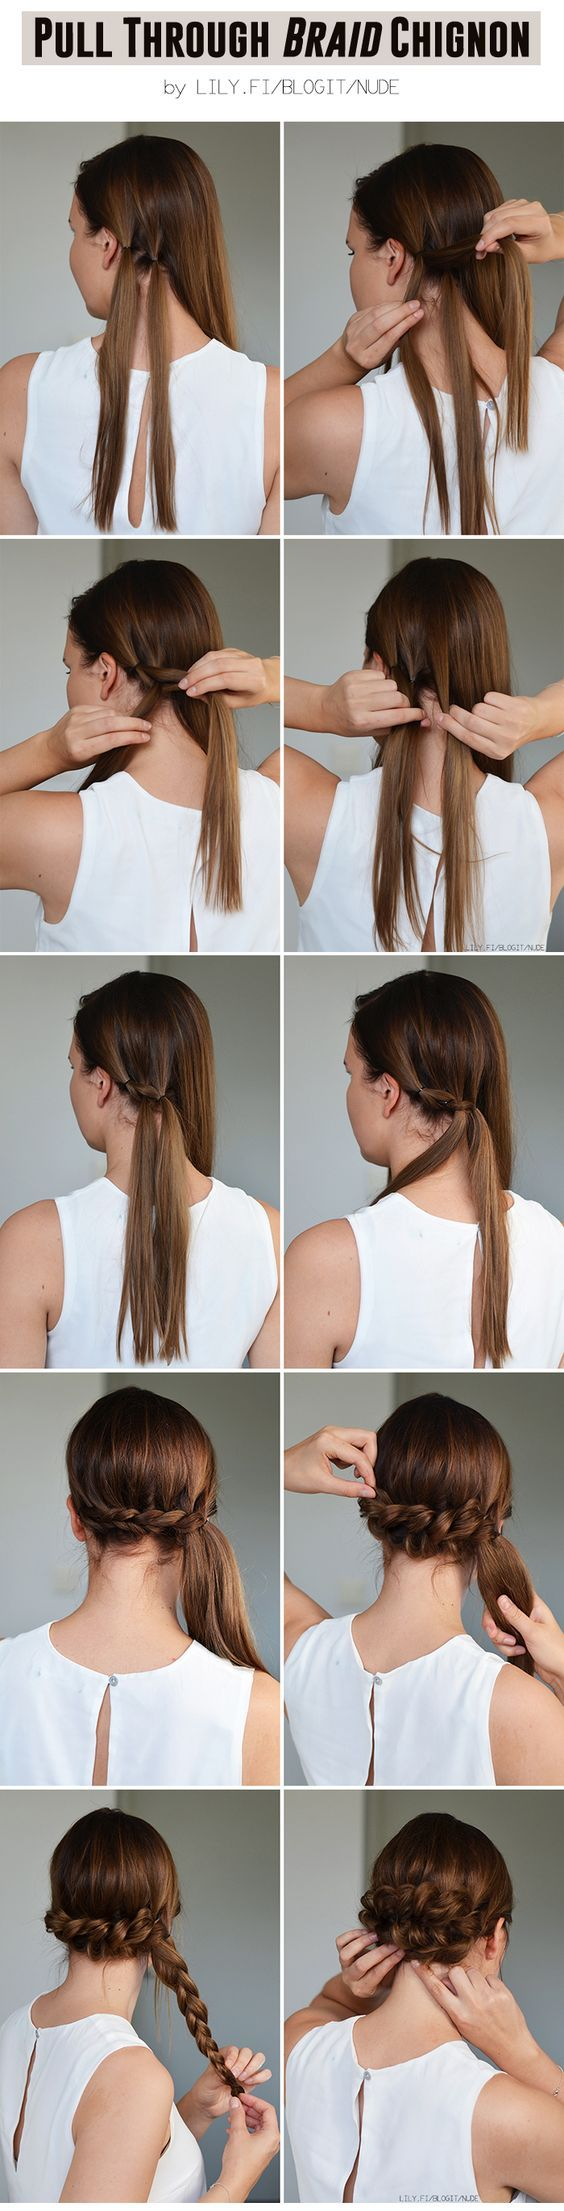 best images about peinados phospital on pinterest aunt upside